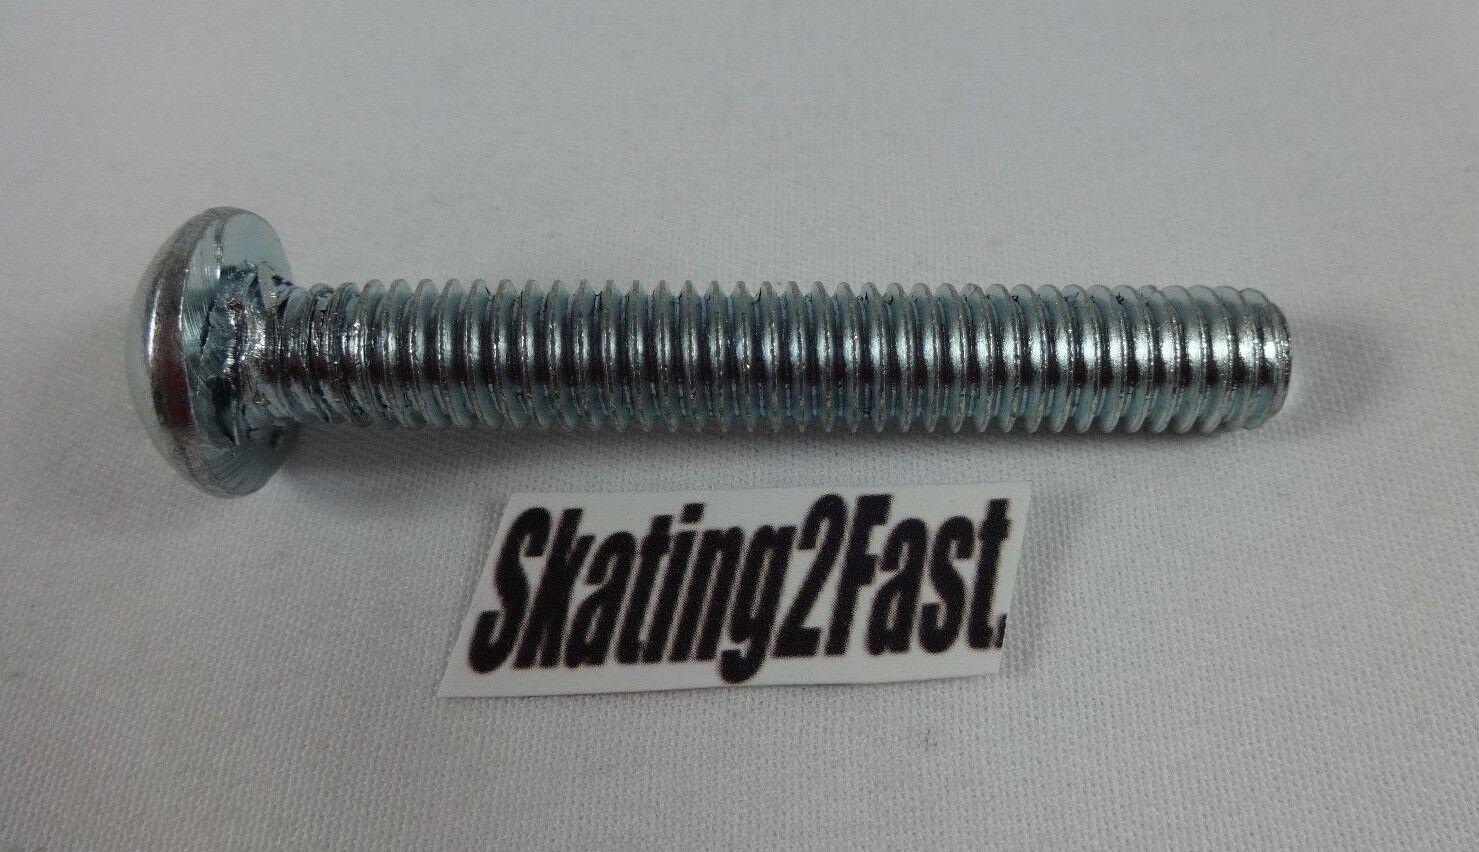 NEW Replacement LASER Skate Plate Action Bolt / Kingpin Slot Head Roller Skate